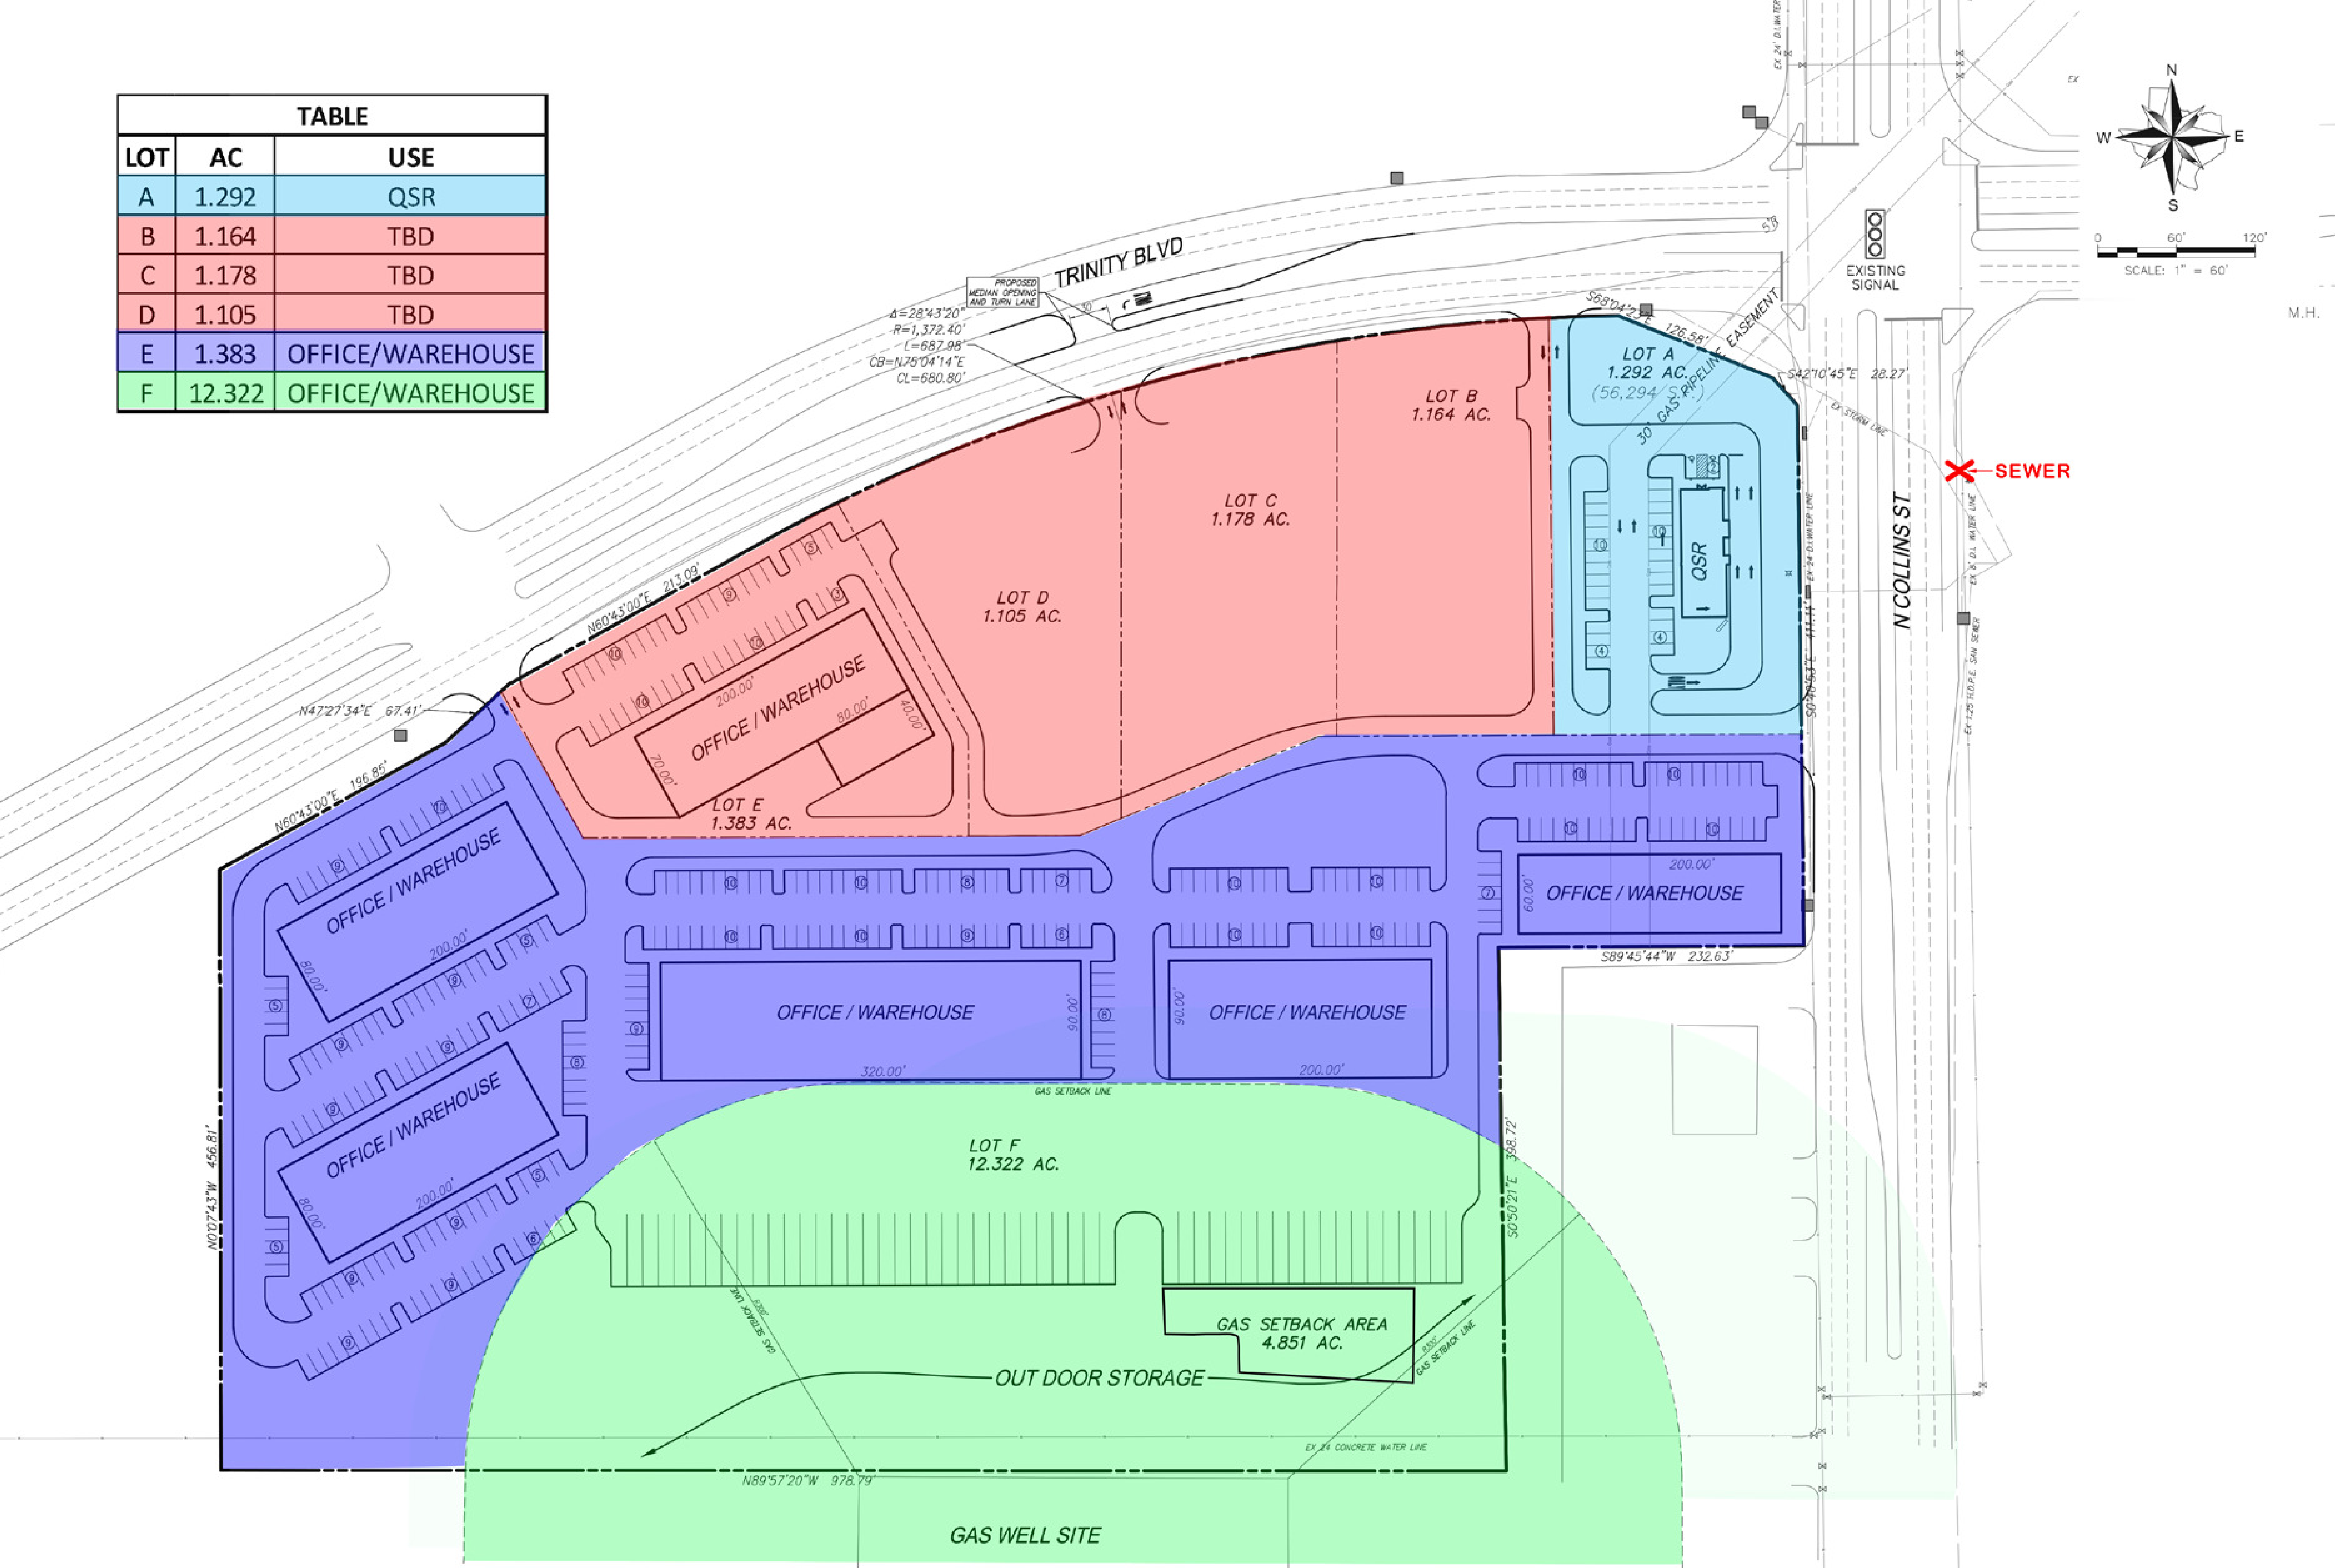 SWC FM 157 & Trinity Blvd: site plan